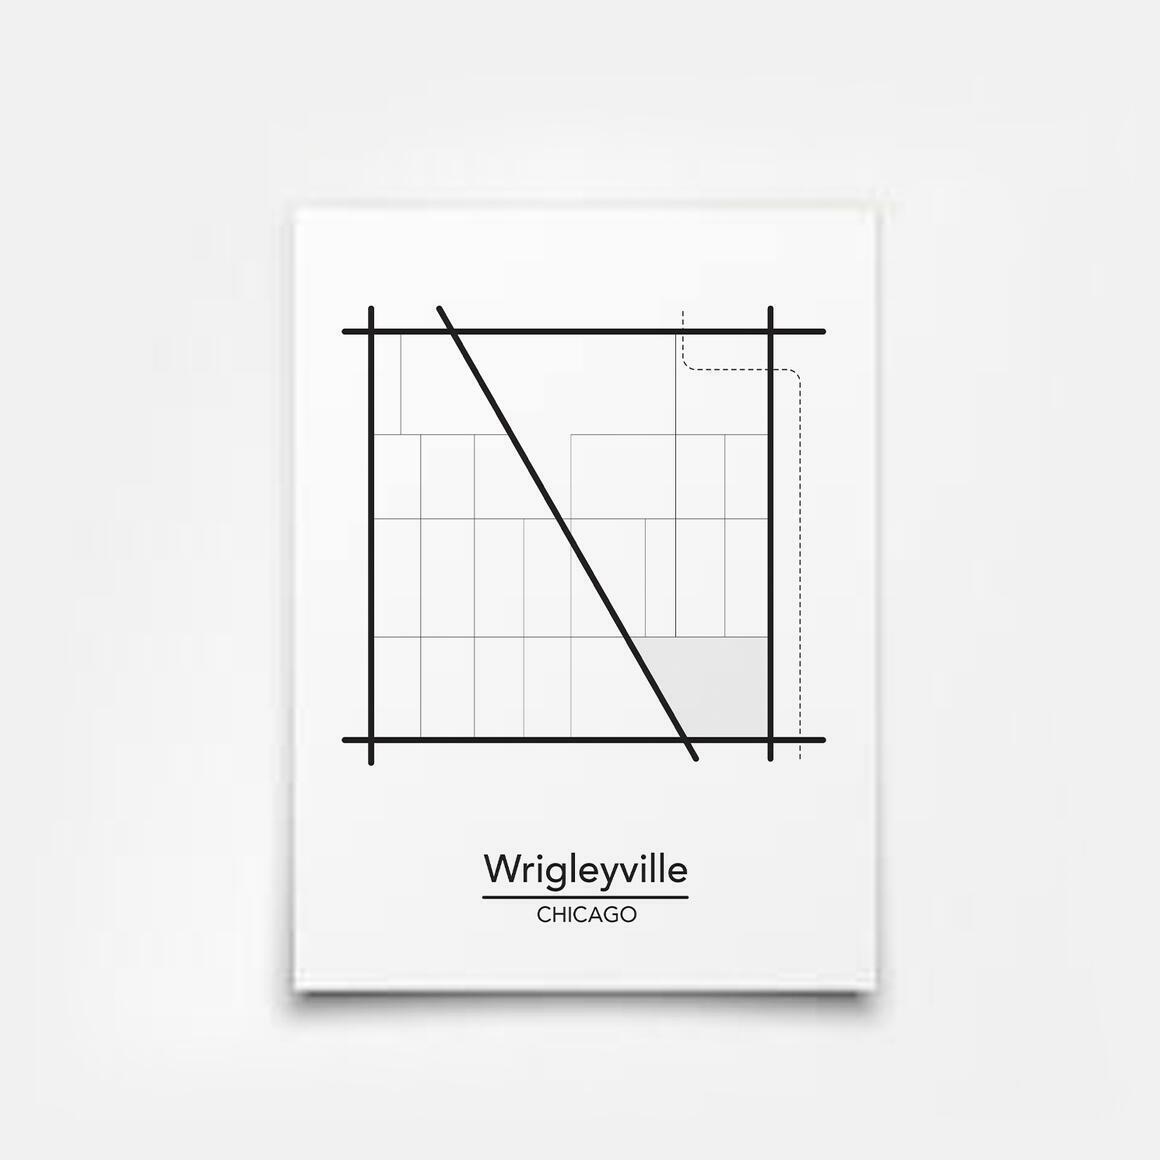 Wrigleyville - Chicago Neighborhood Map Print | Trada Marketplace